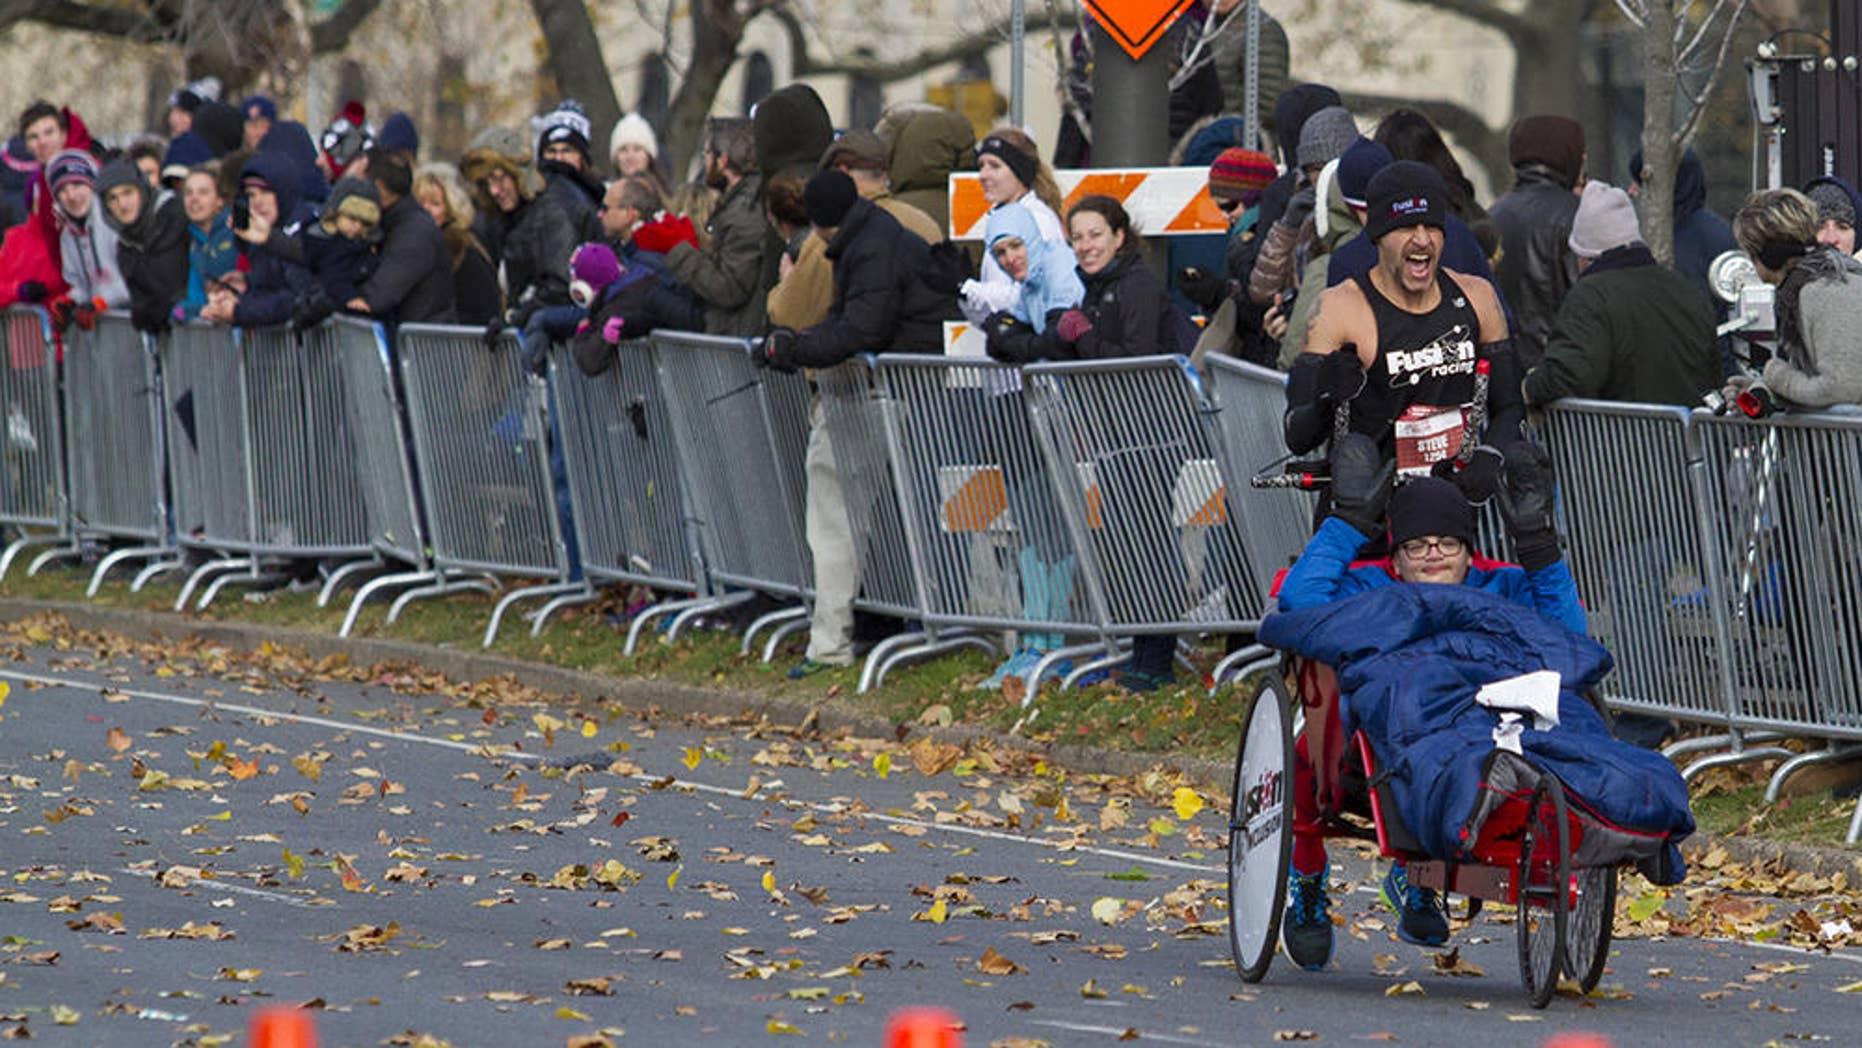 Steve Sinko and his partner Preston Buenaga flew through the Philly marathon course together on November 20, 2016.